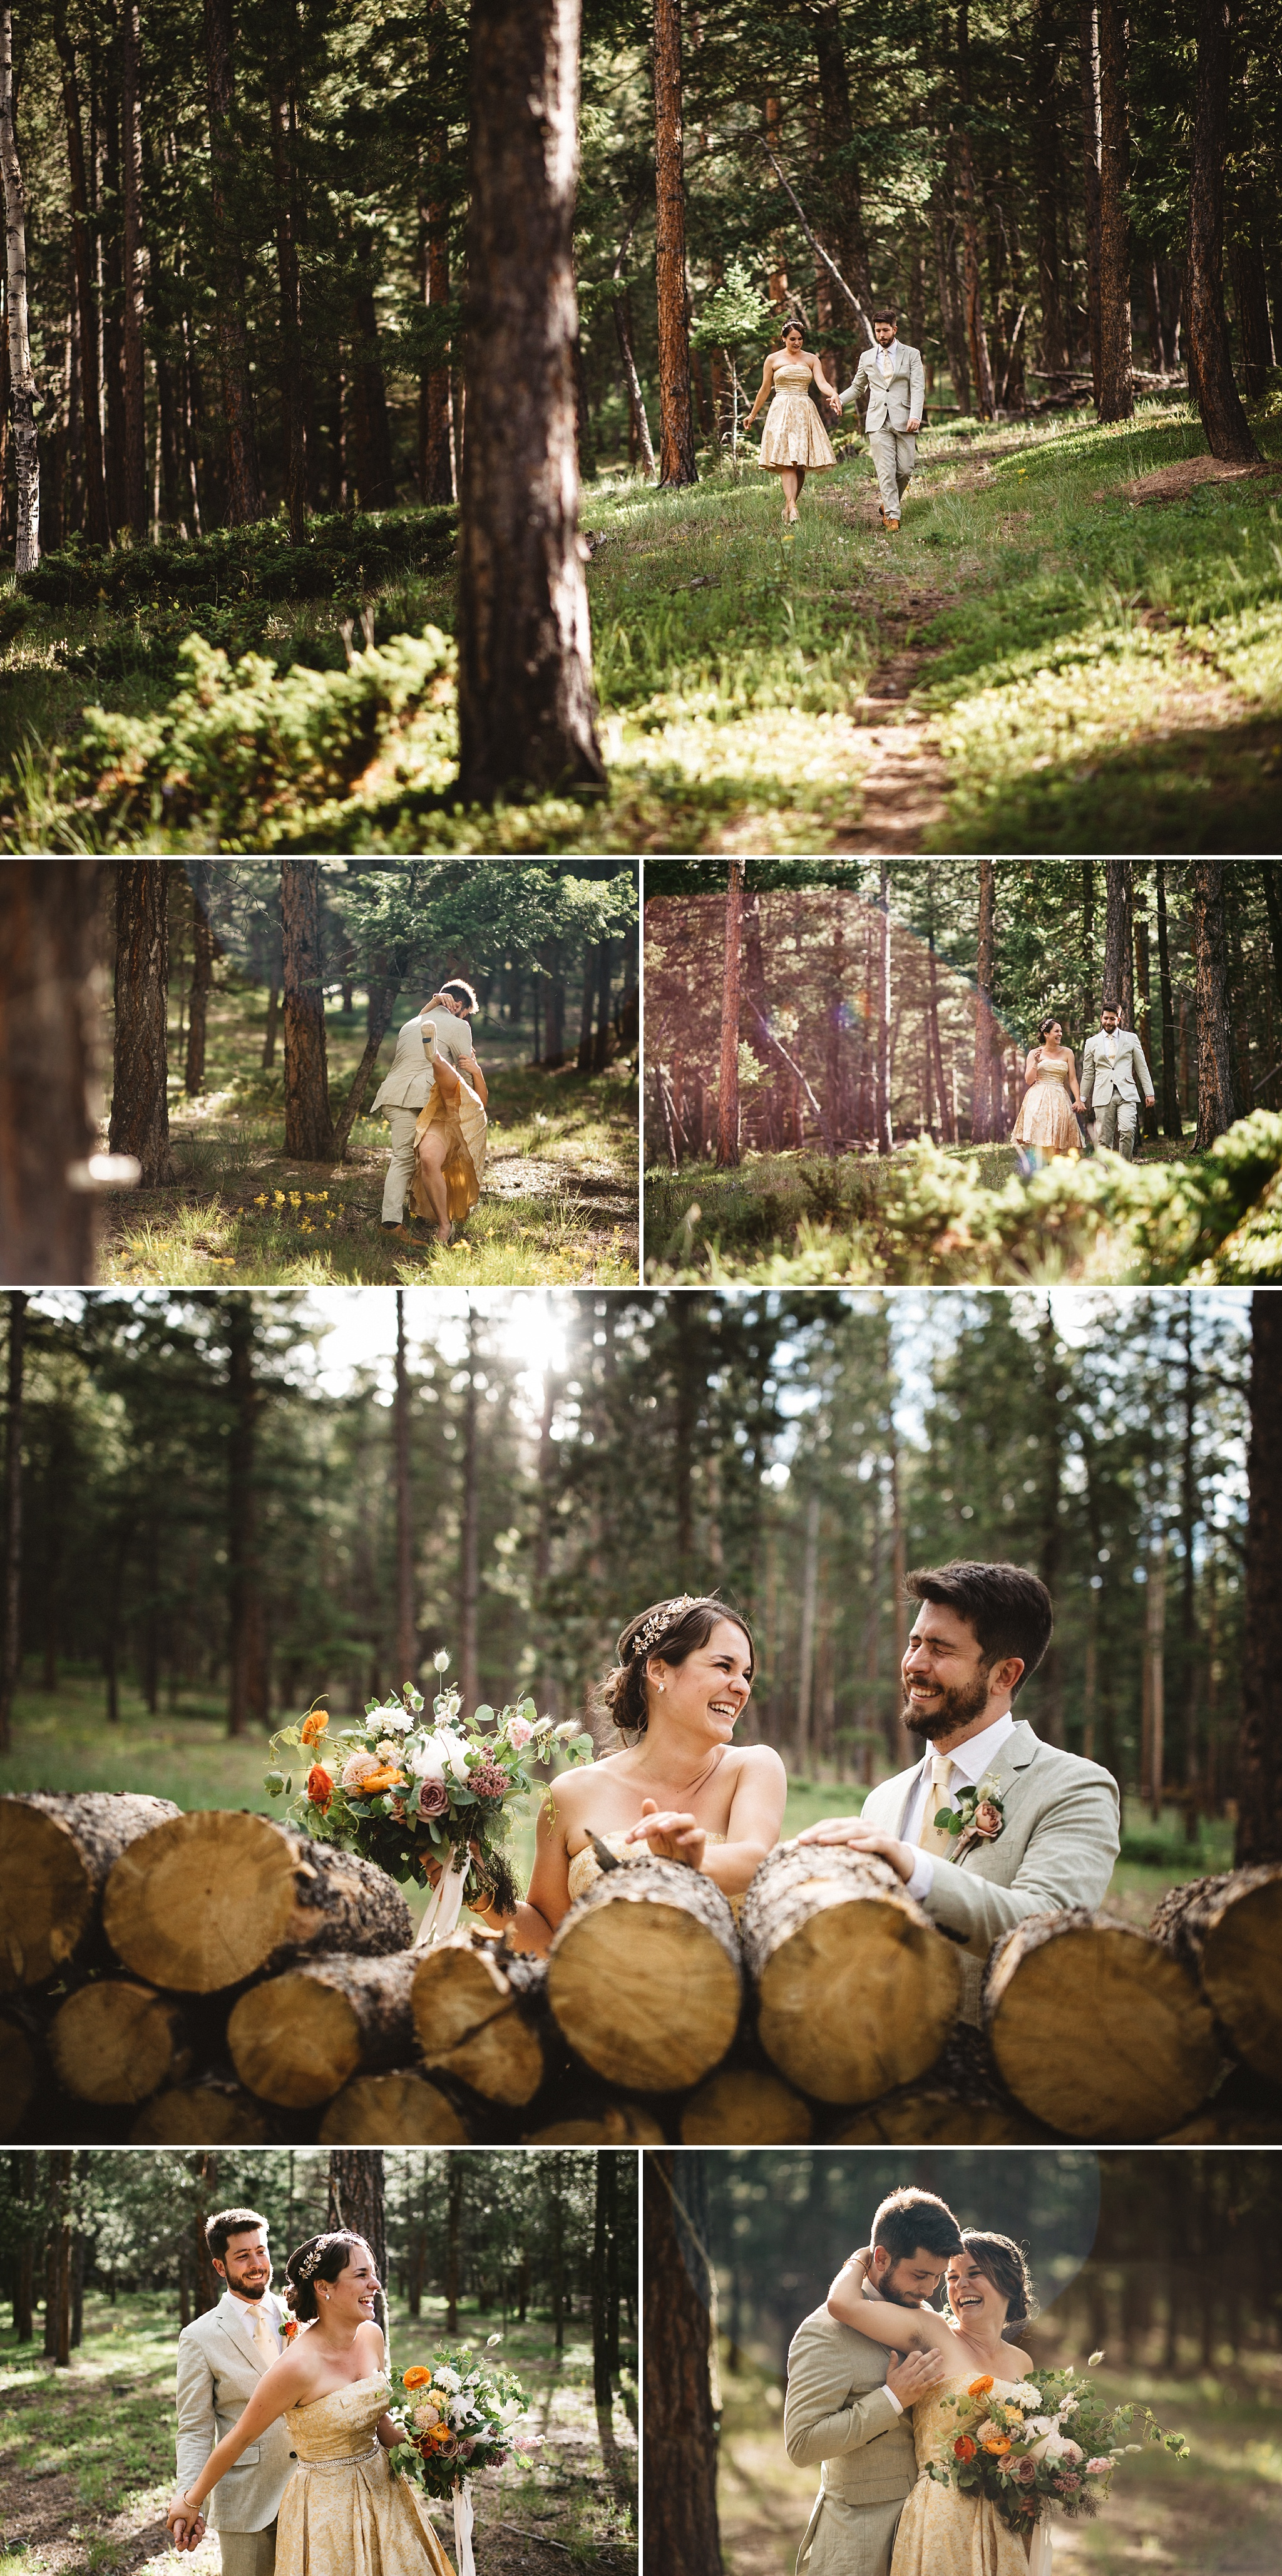 Ansley+Julian-Willow-Creek-Ranch-Evergreen-Wedding-042_WEB.jpg